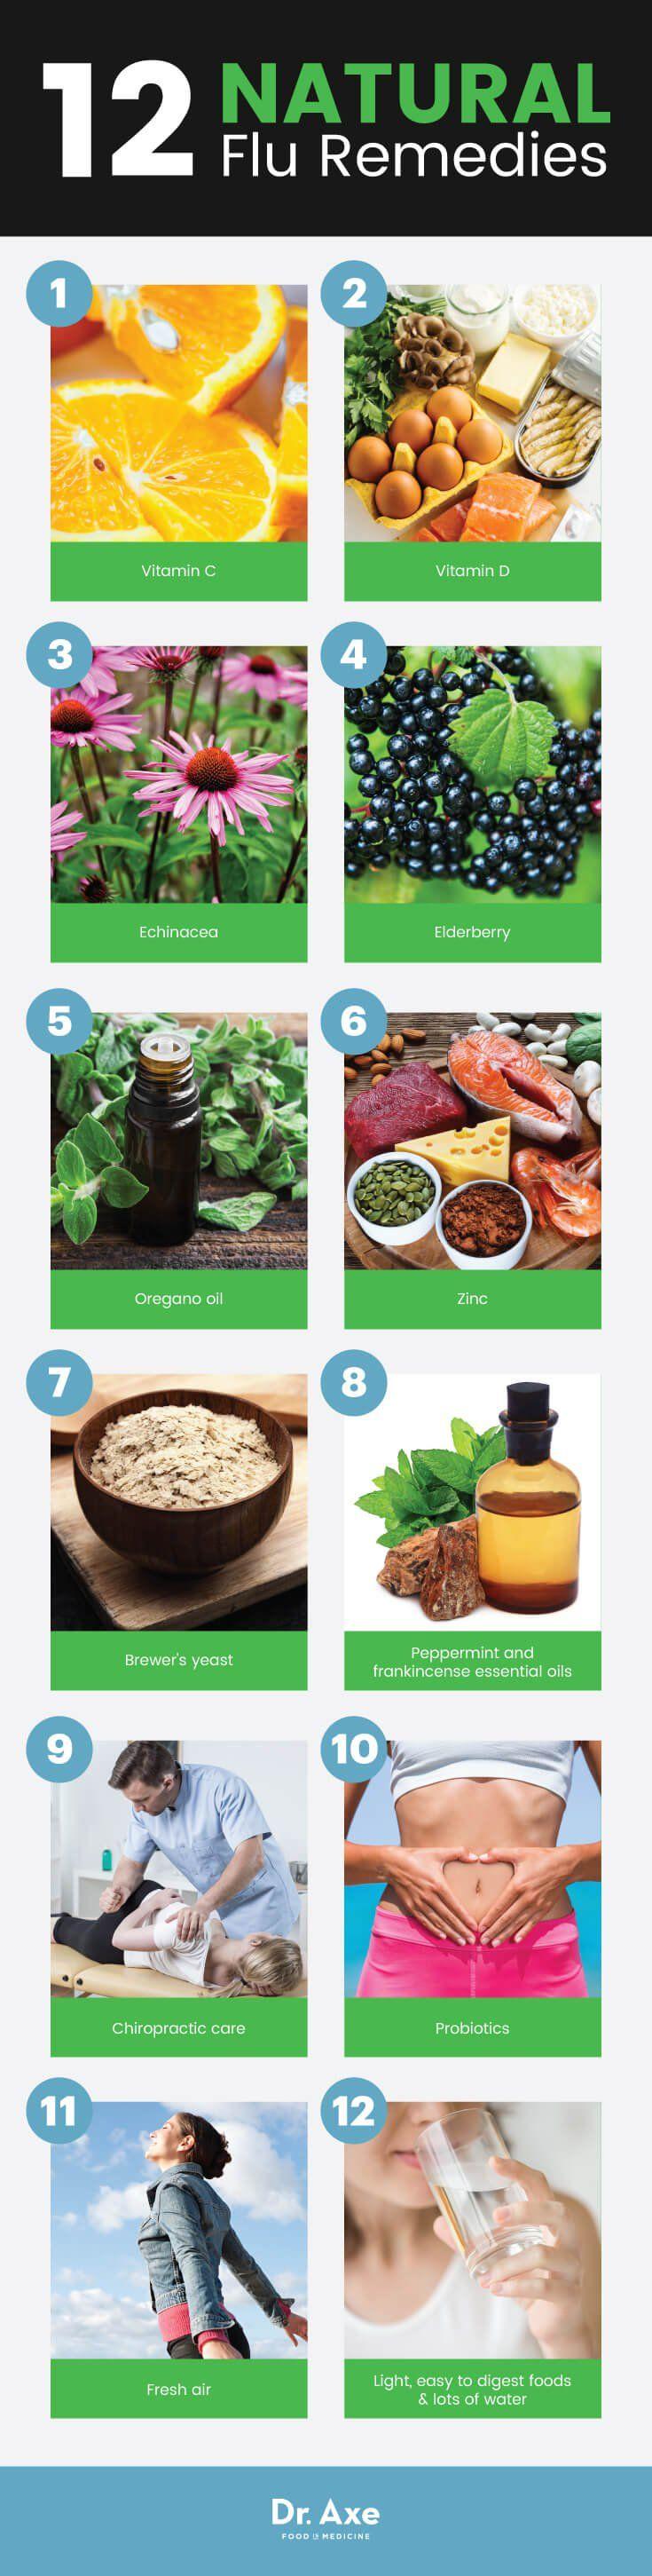 12 flu natural remedies - Dr. Axe